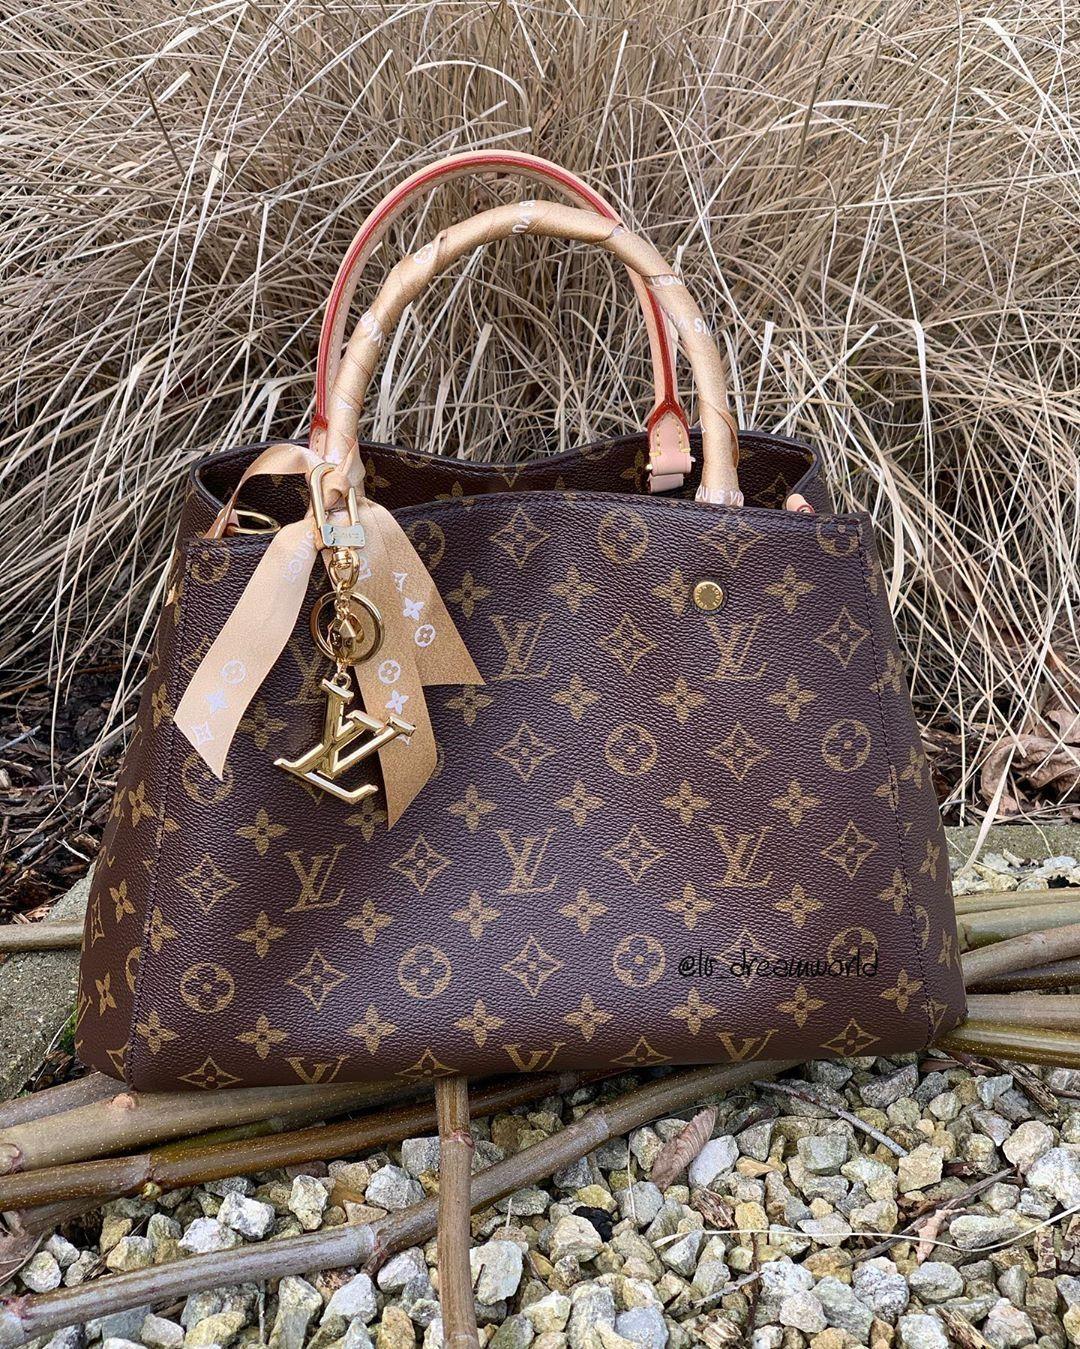 What Are The Benefits Of Designer Replica Handbags?